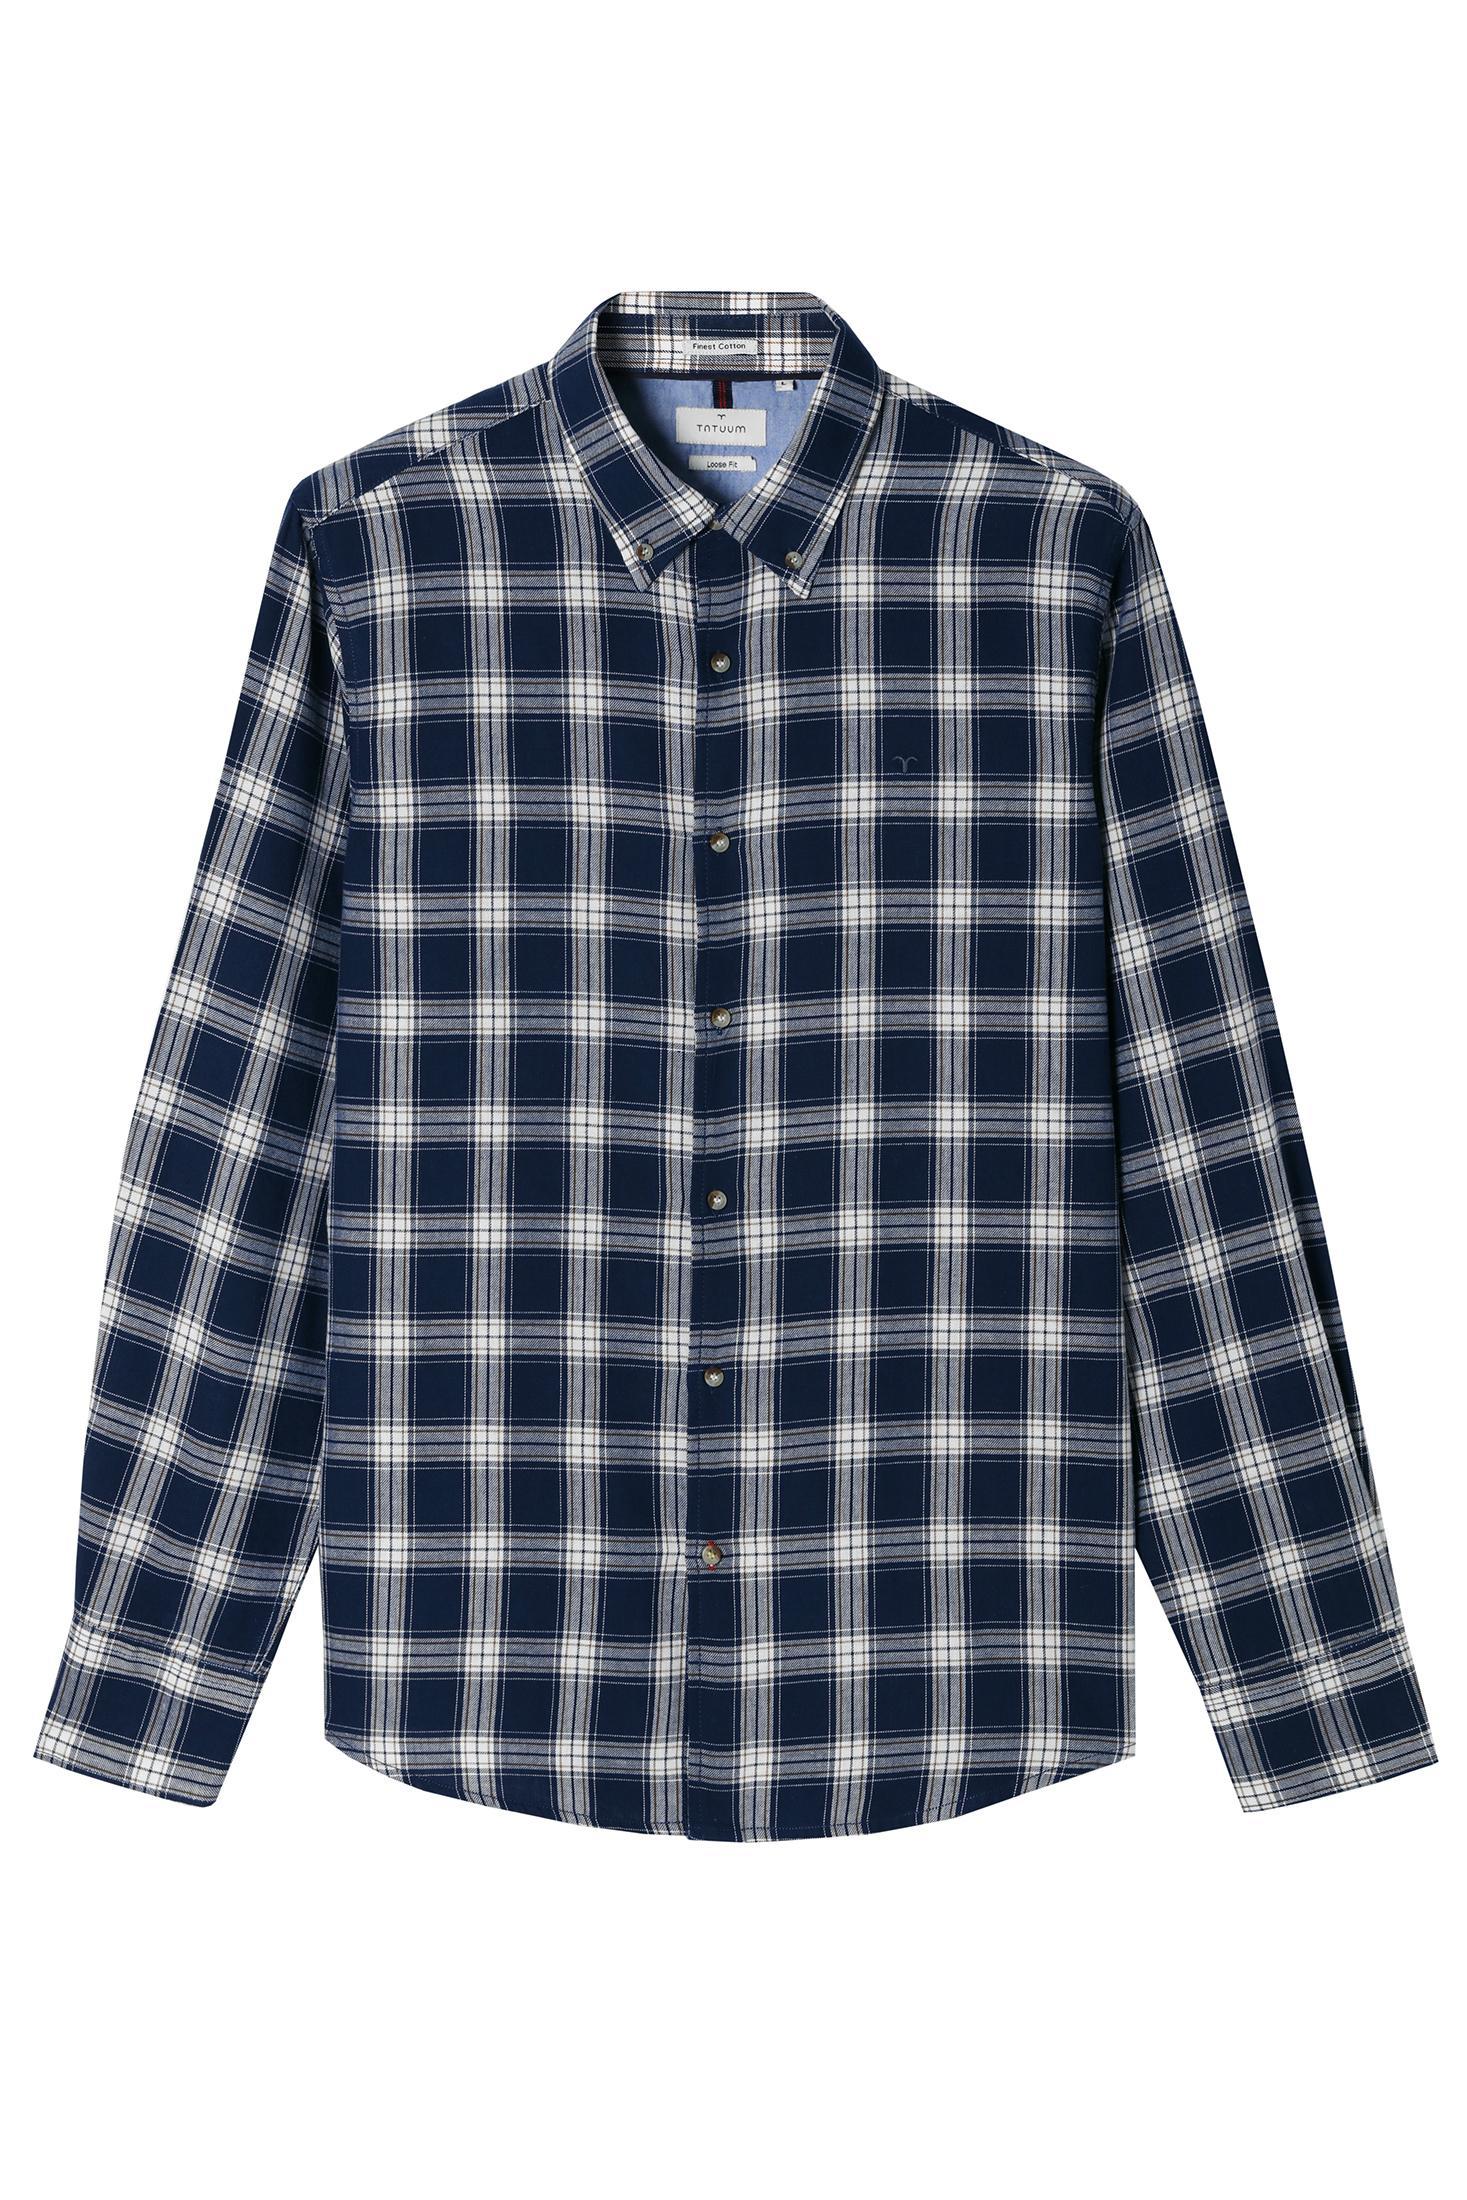 koszula męska długi r. FILIP 8 CLASSIC